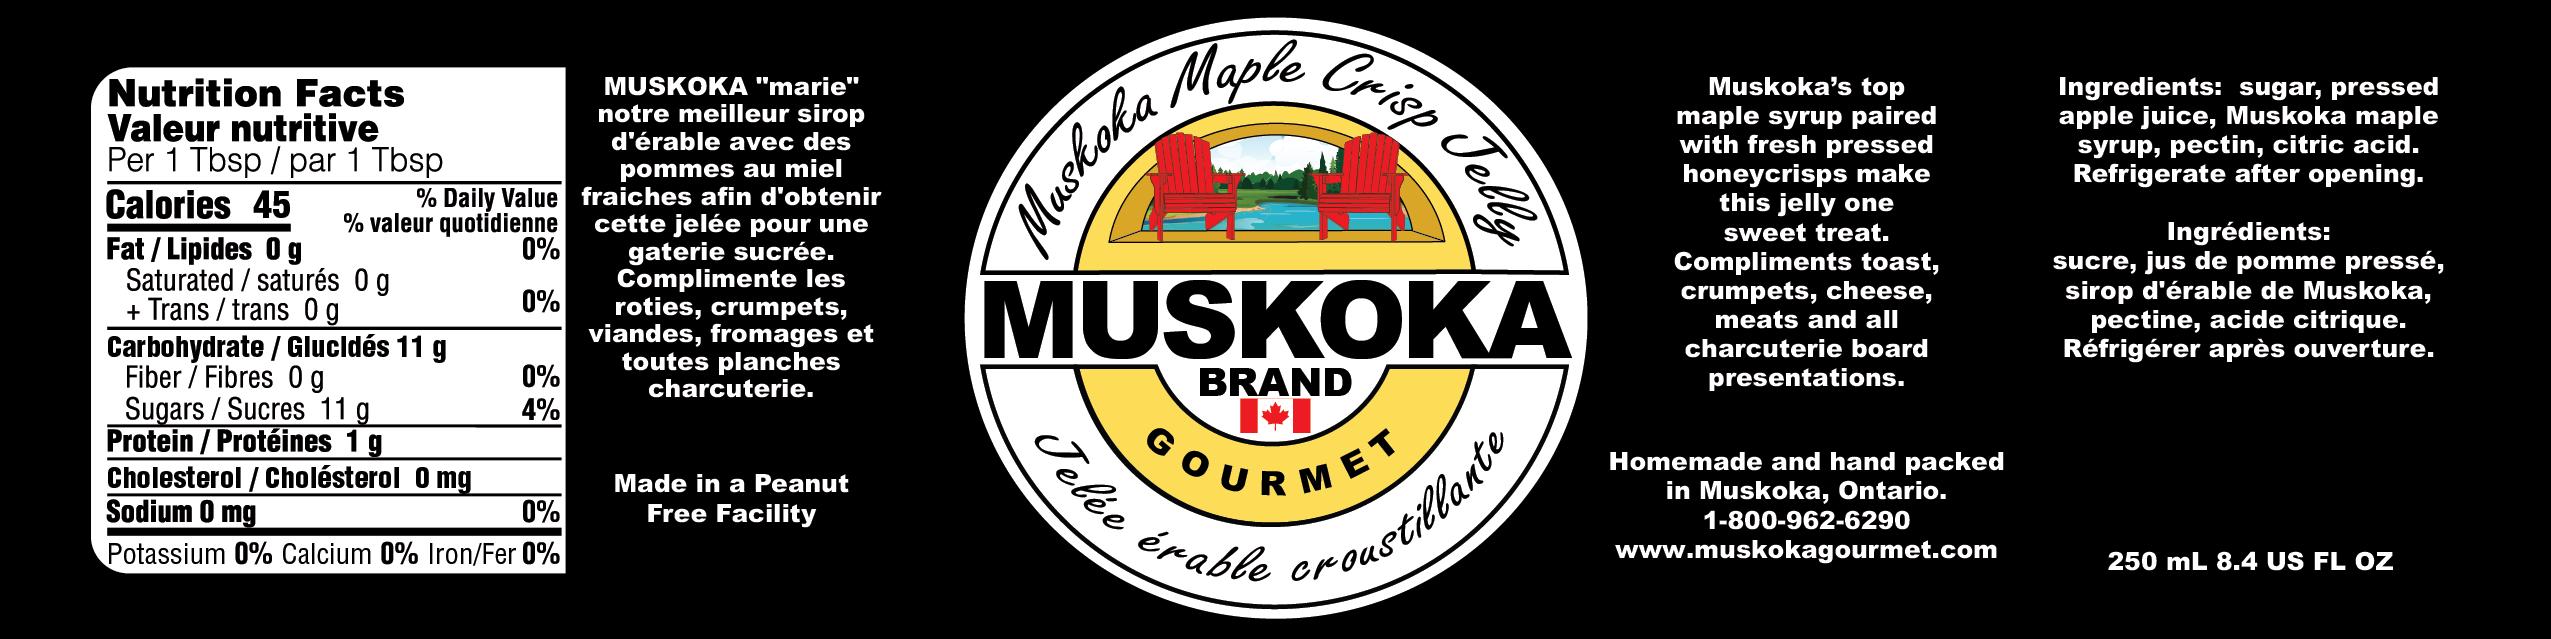 Muskoka maple crisp jelly nutritional and information.